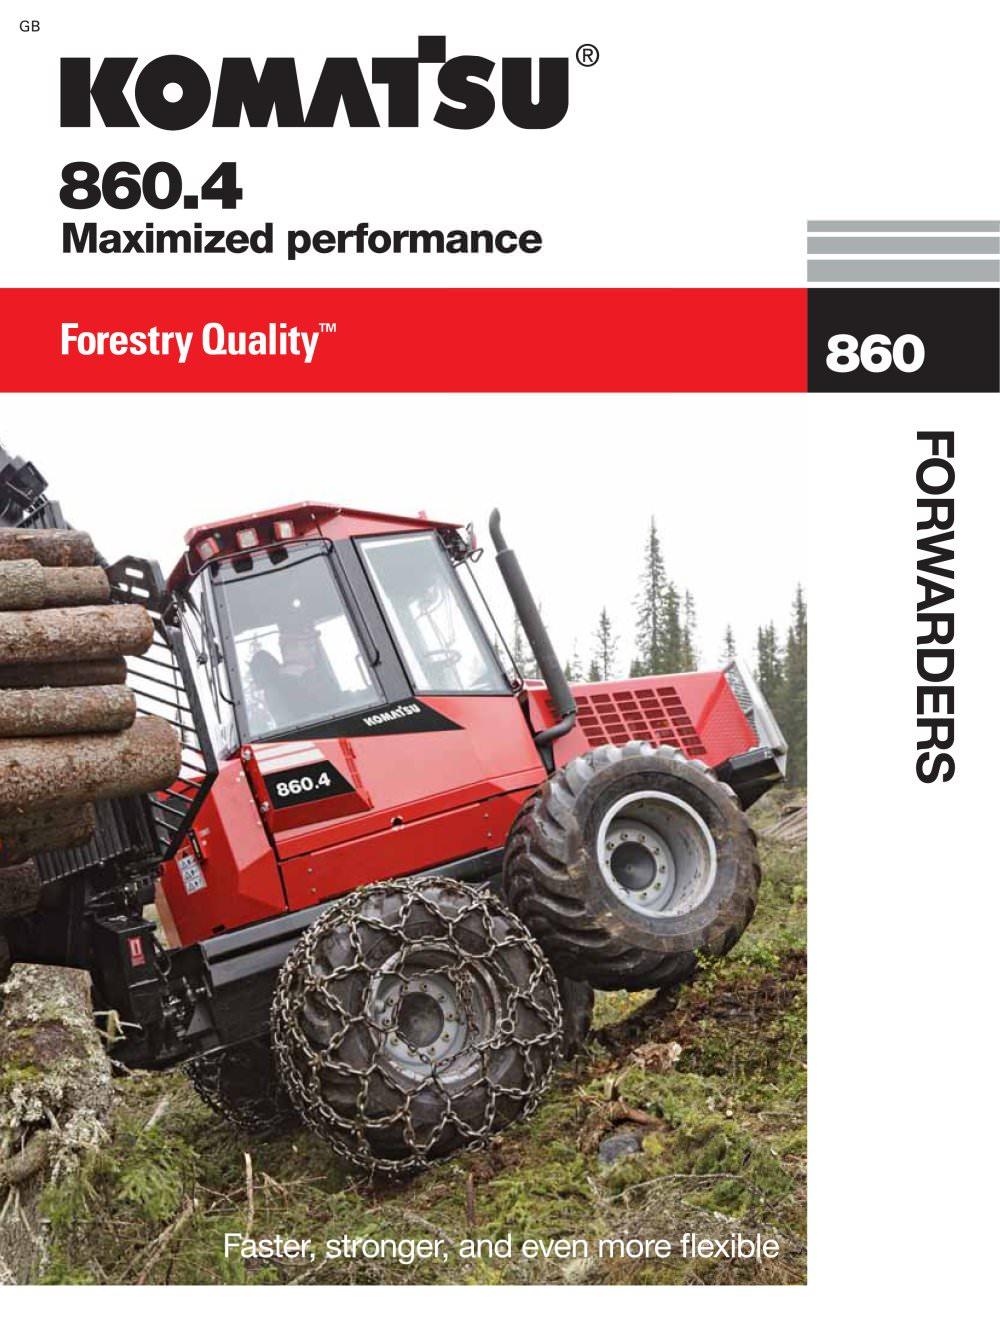 komatsu 860 4 komatsu forest pdf catalogue technical rh pdf directindustry com Valmet Paper Valmet Gun